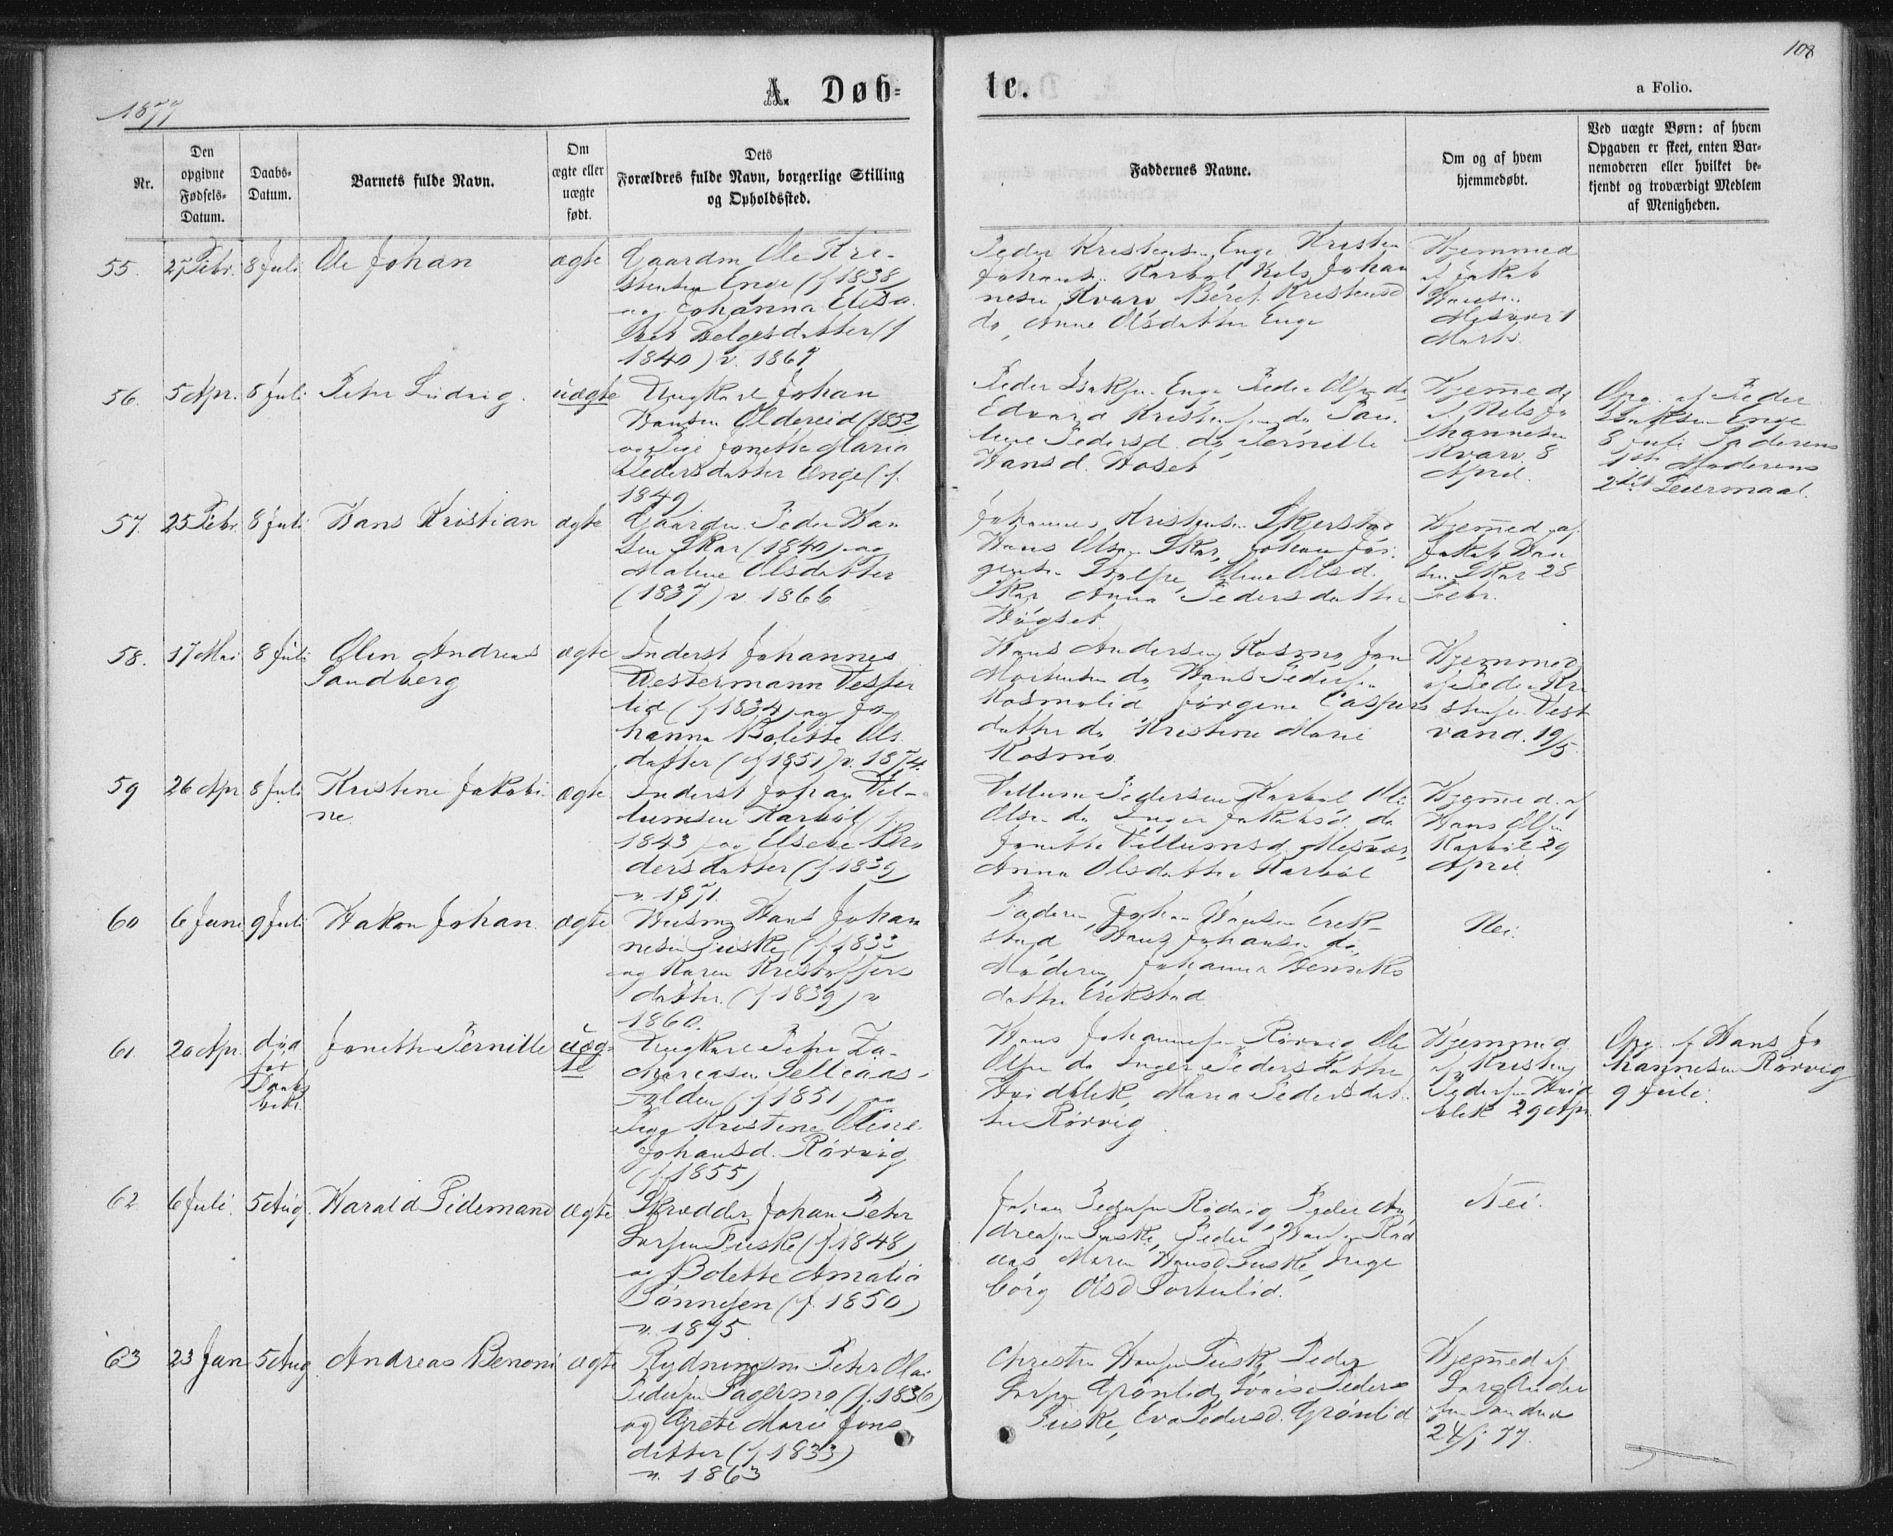 SAT, Ministerialprotokoller, klokkerbøker og fødselsregistre - Nordland, 852/L0739: Ministerialbok nr. 852A09, 1866-1877, s. 108